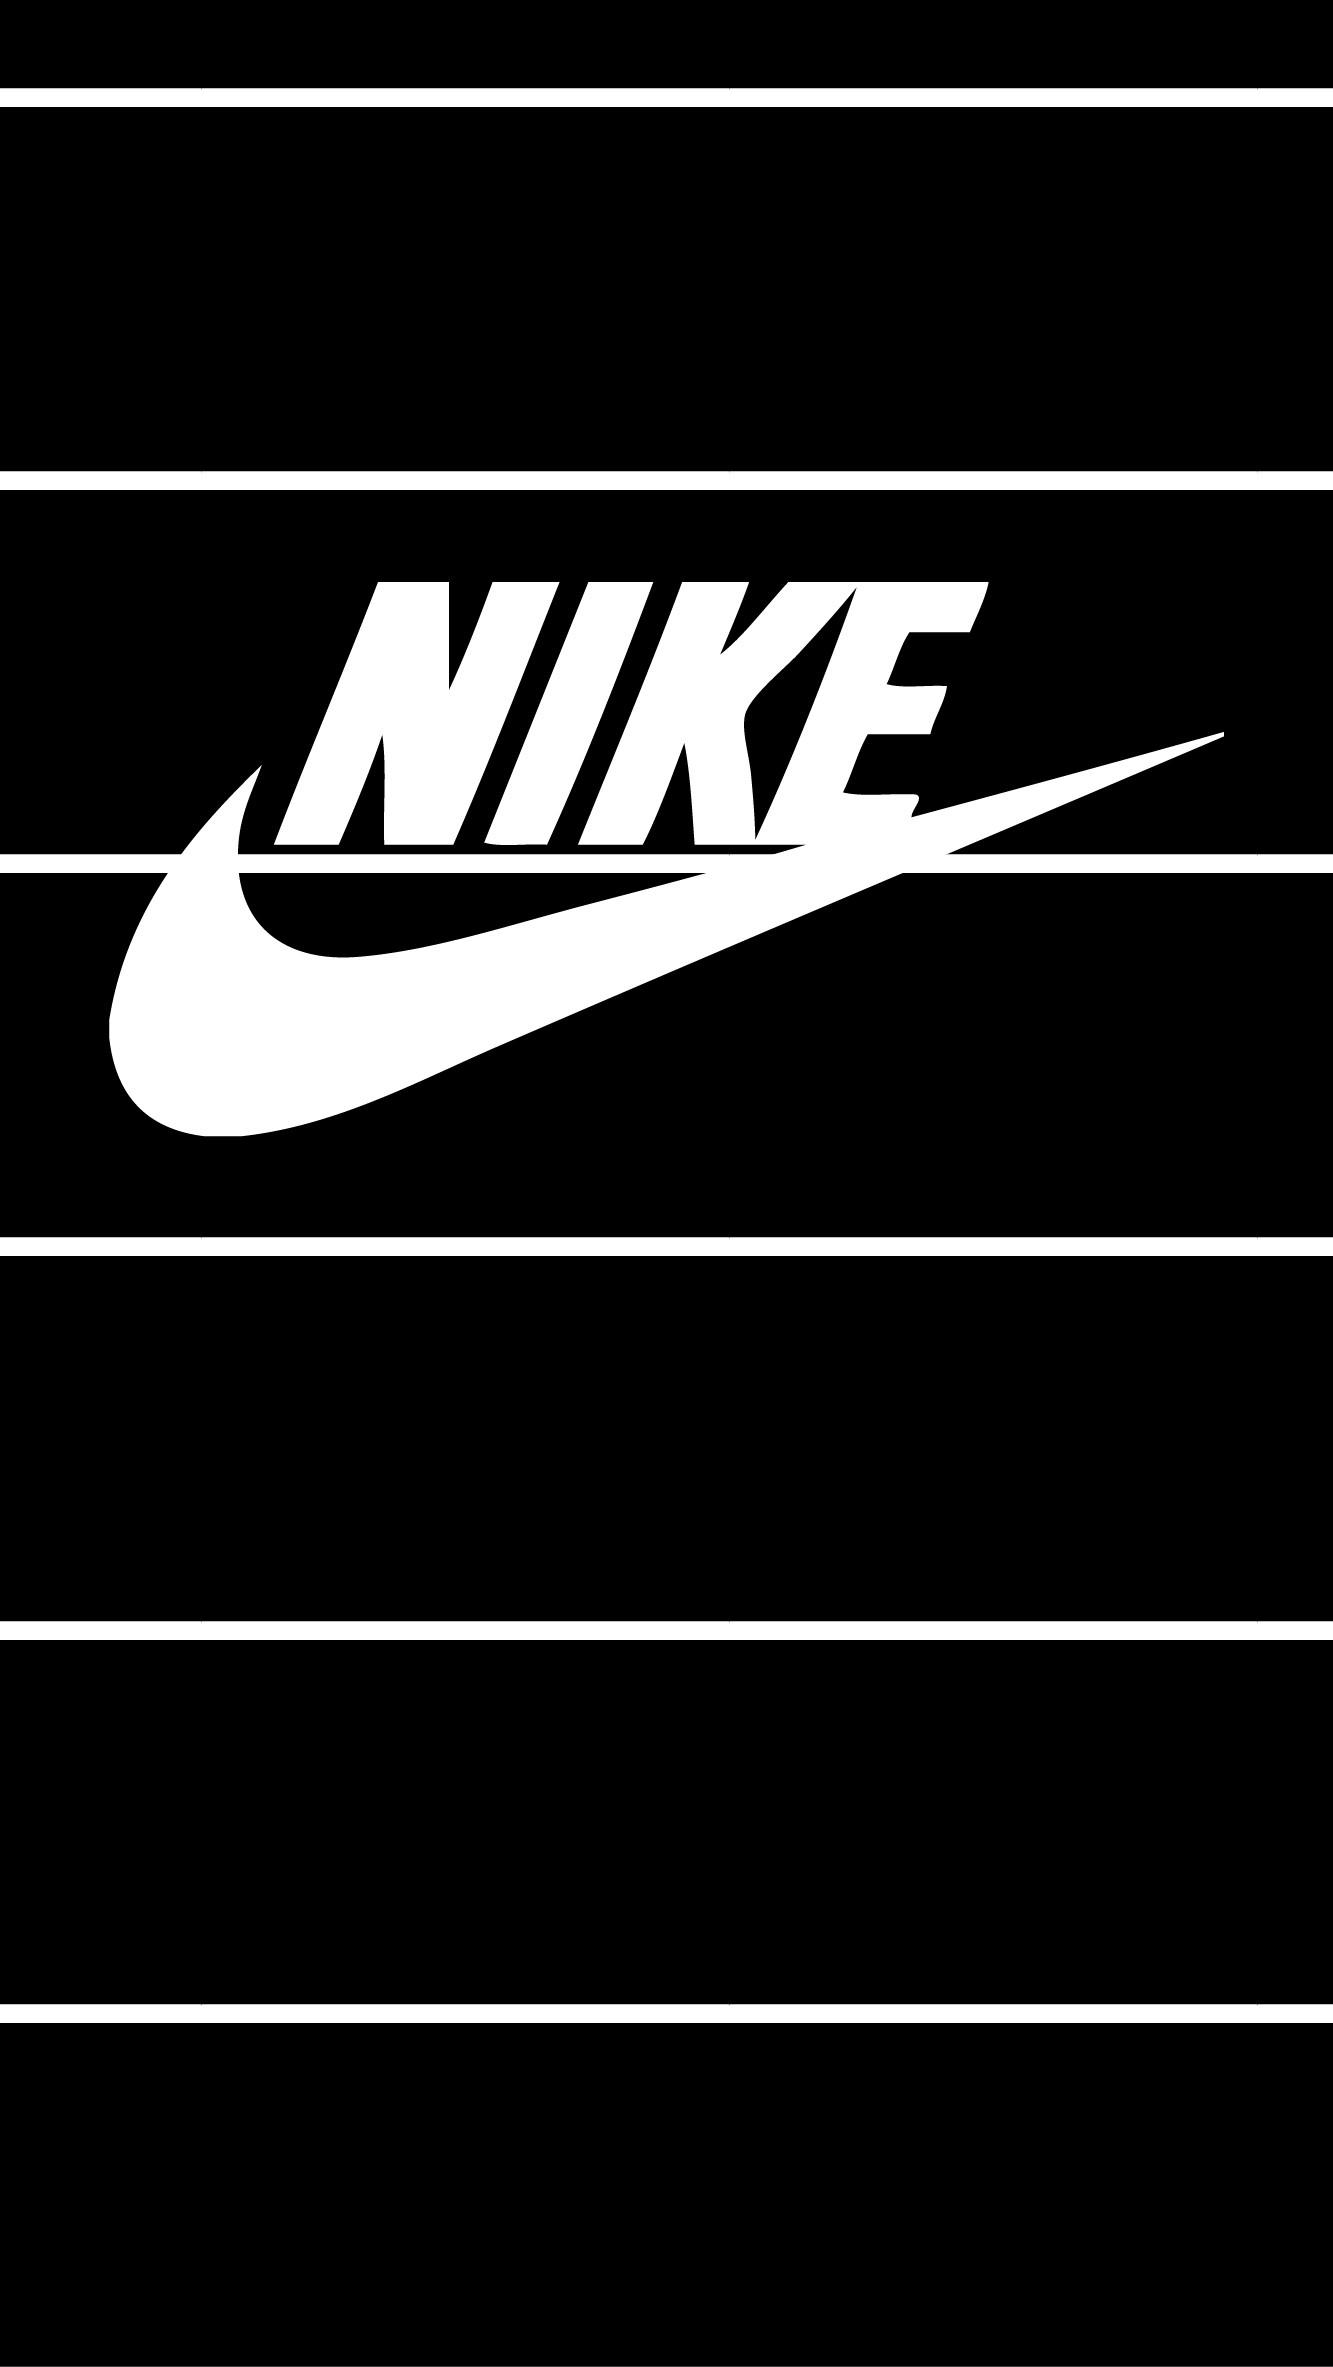 Stussy Hd Wallpaper Dope Nike Wallpaper 79 Images